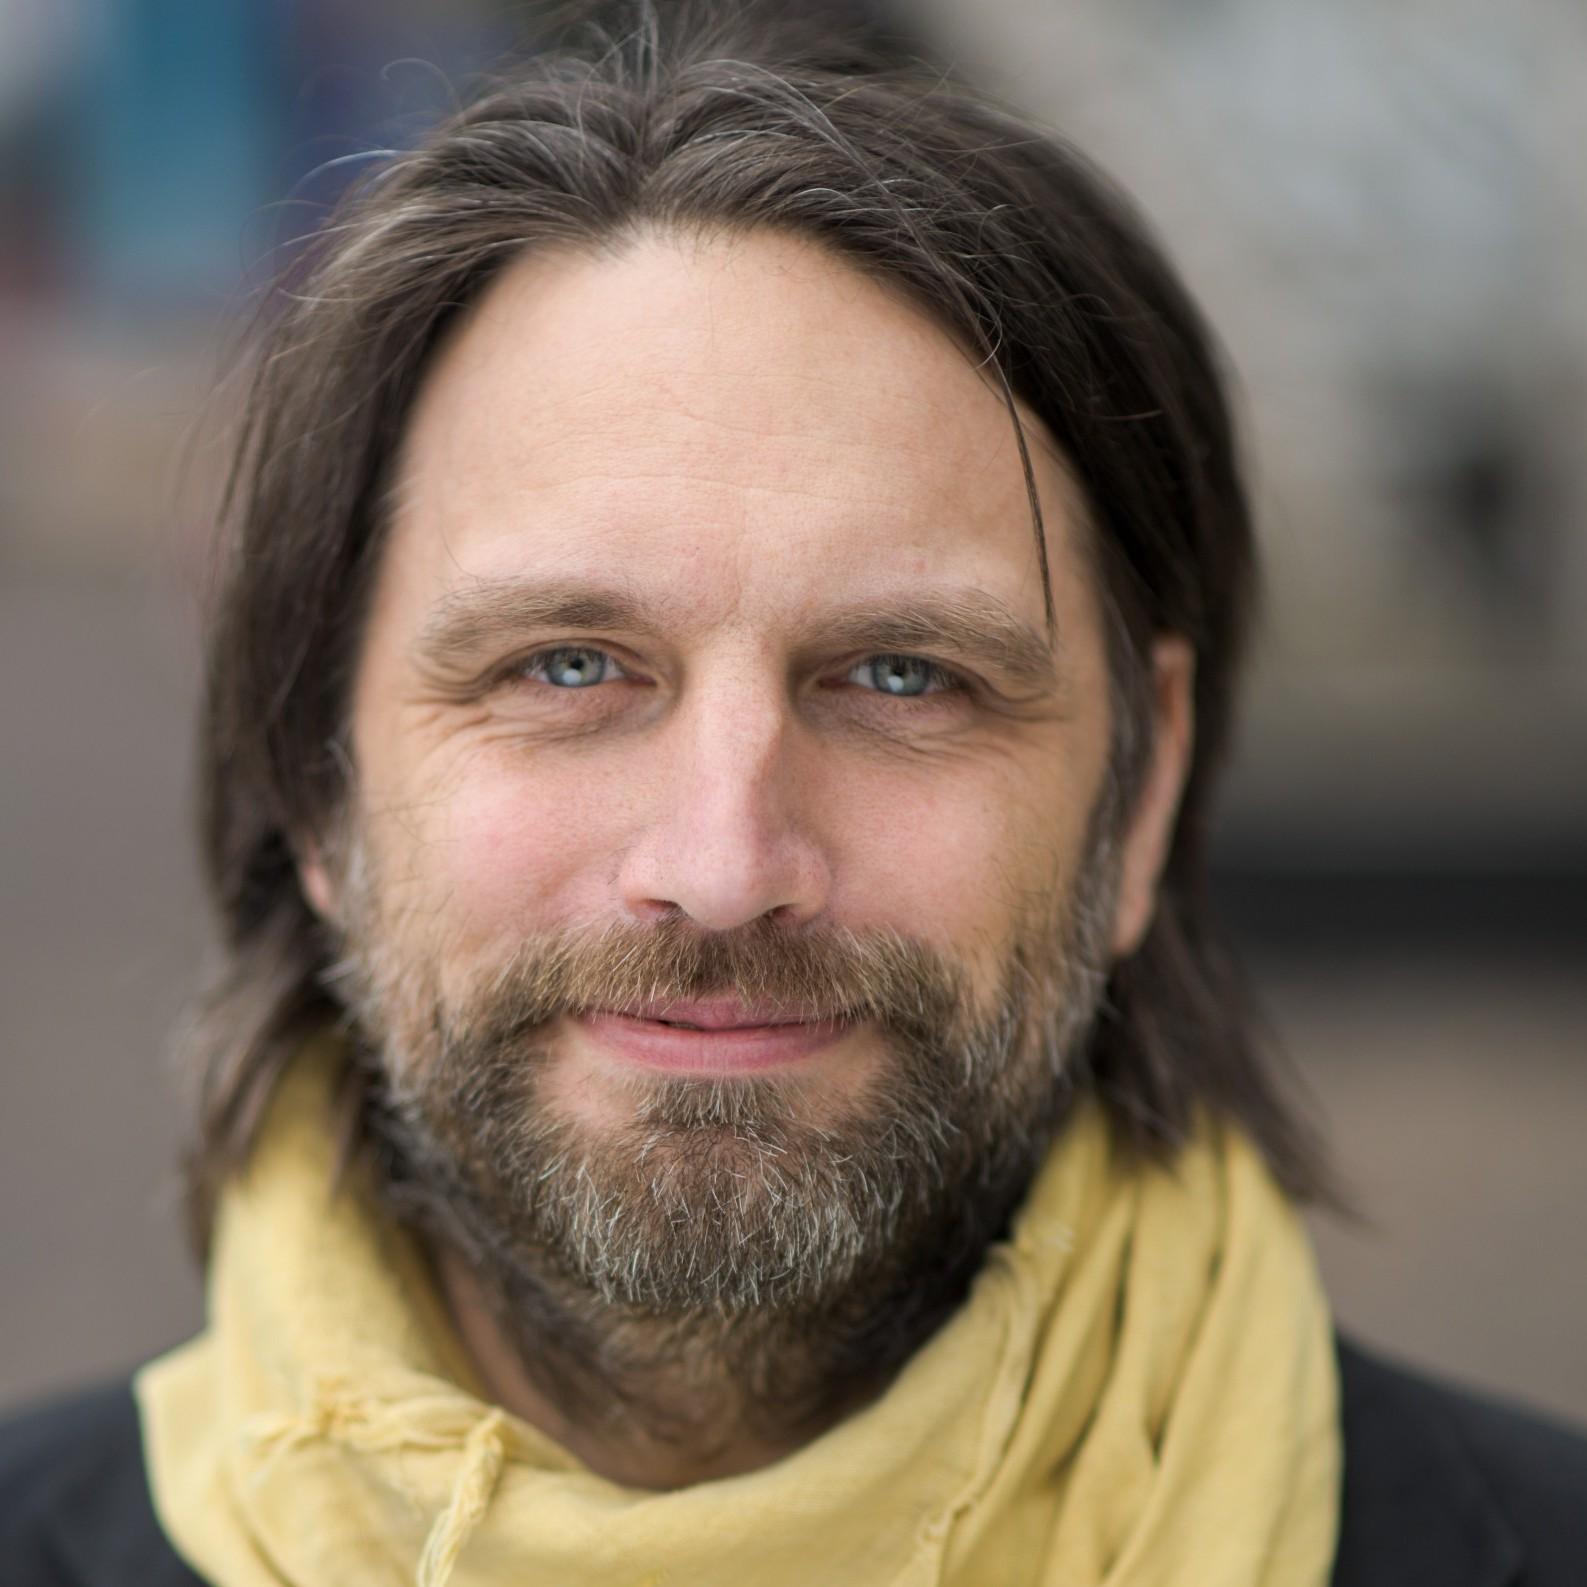 Karl-Heinz Garcia Bergt